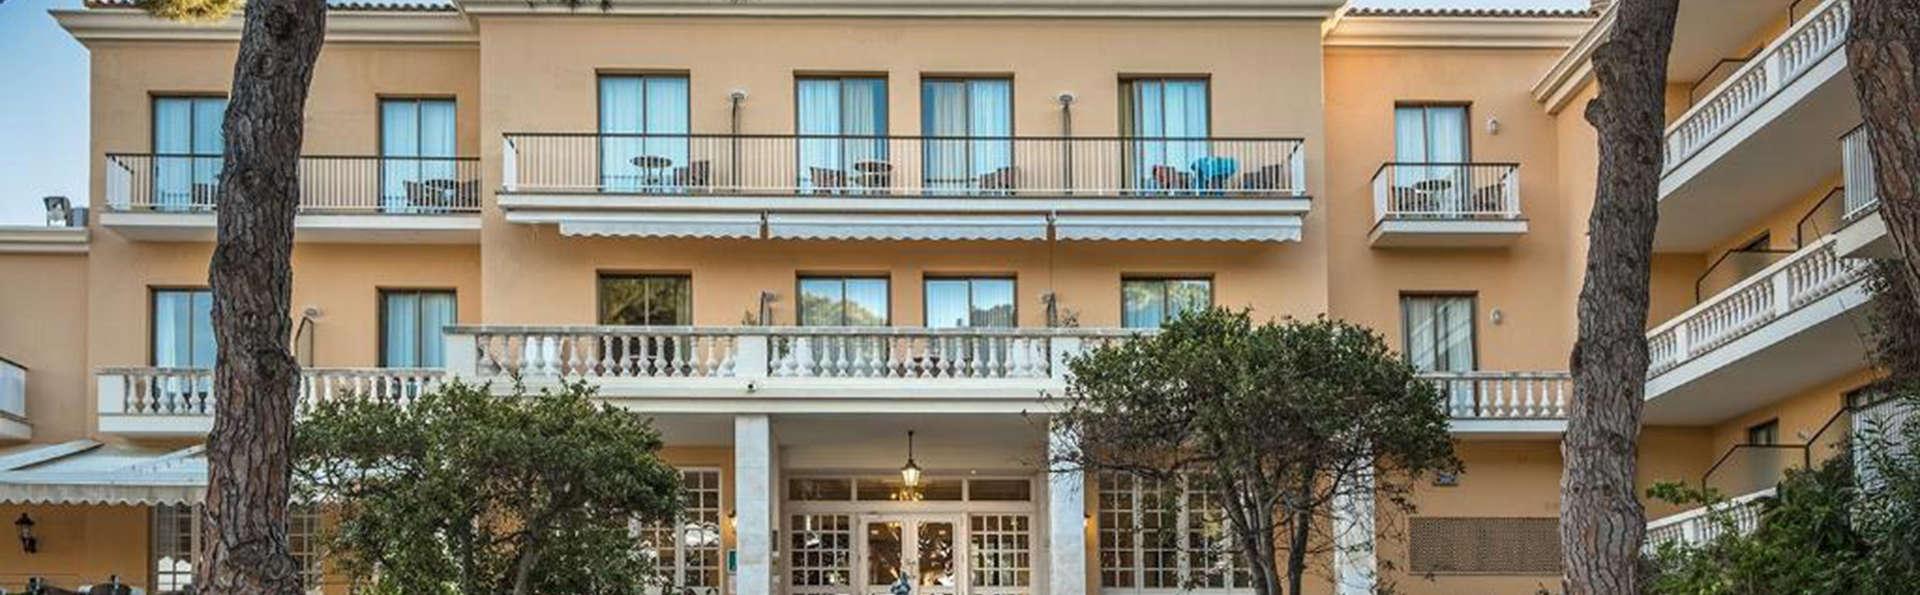 S'Agaró Hotel Wellness & Spa - EDIT_FACHADA.jpg